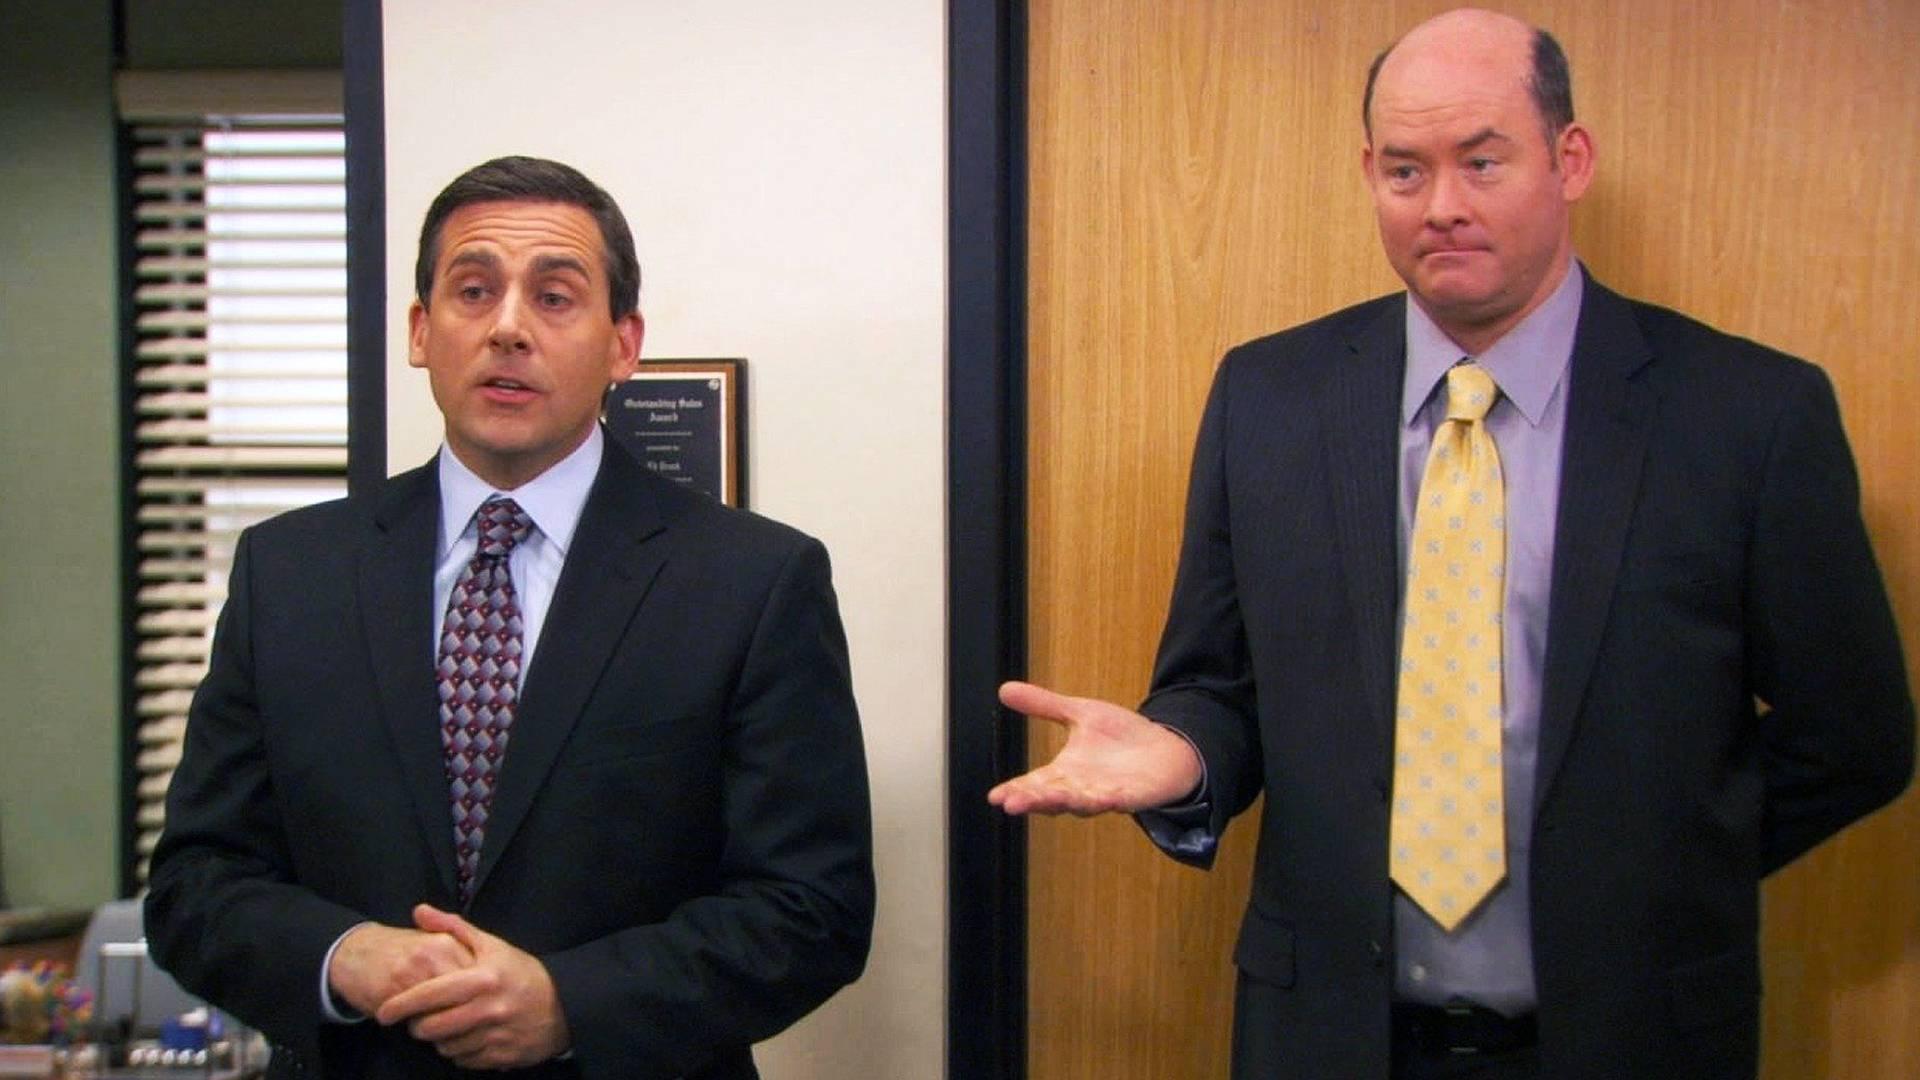 The Office Season 7 Episode 18